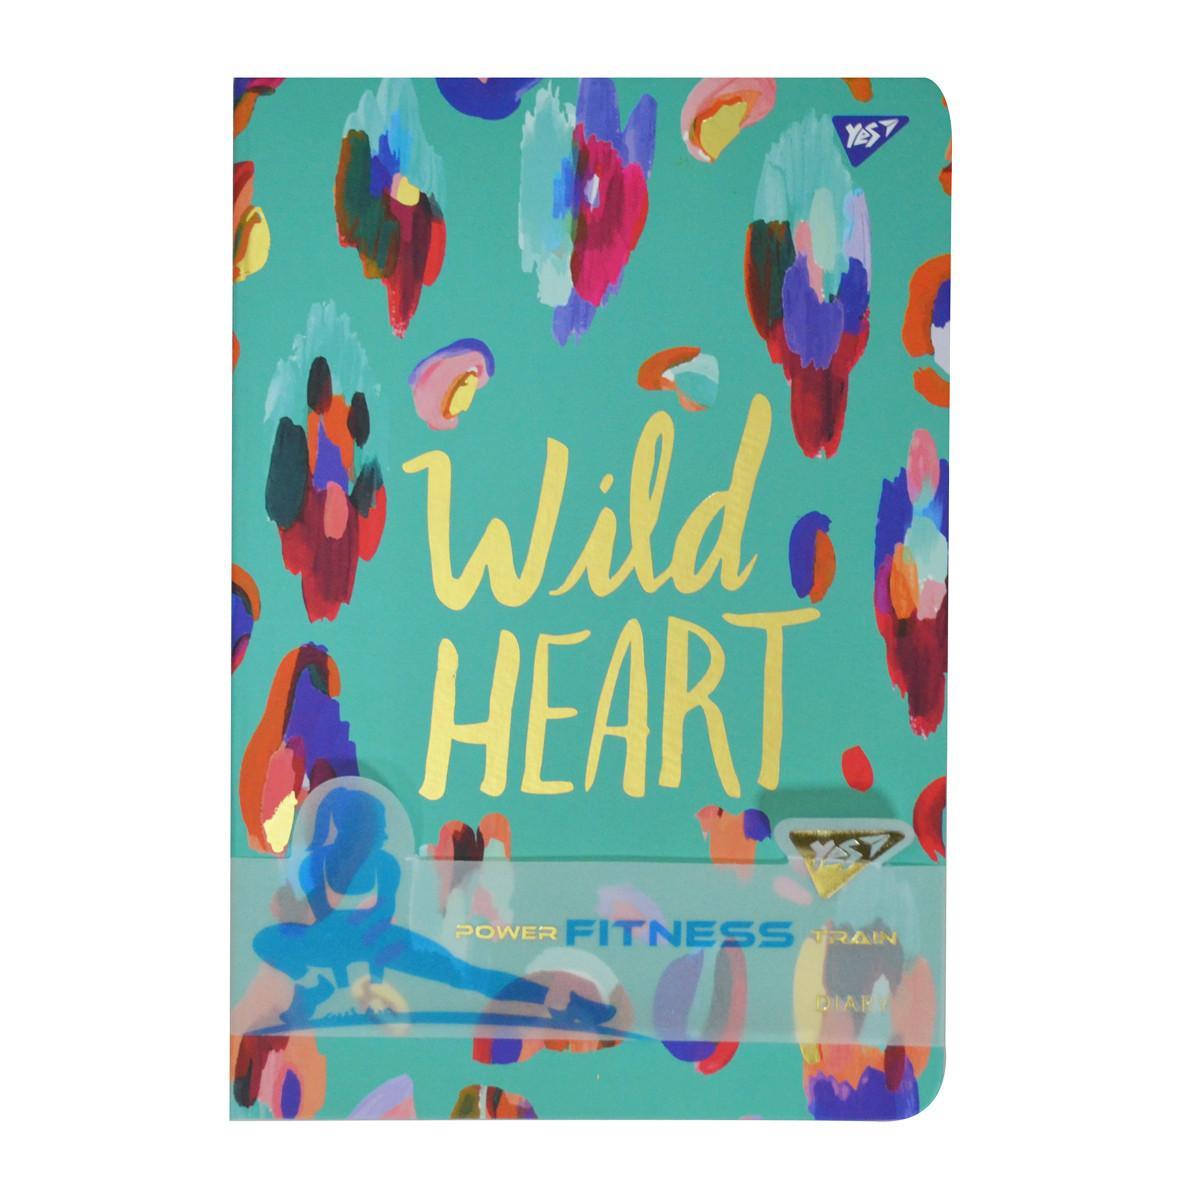 Блокнот-мотиватор для девочки YES Wild Heart серии Fitness 140 х 210мм 96л. код:151581